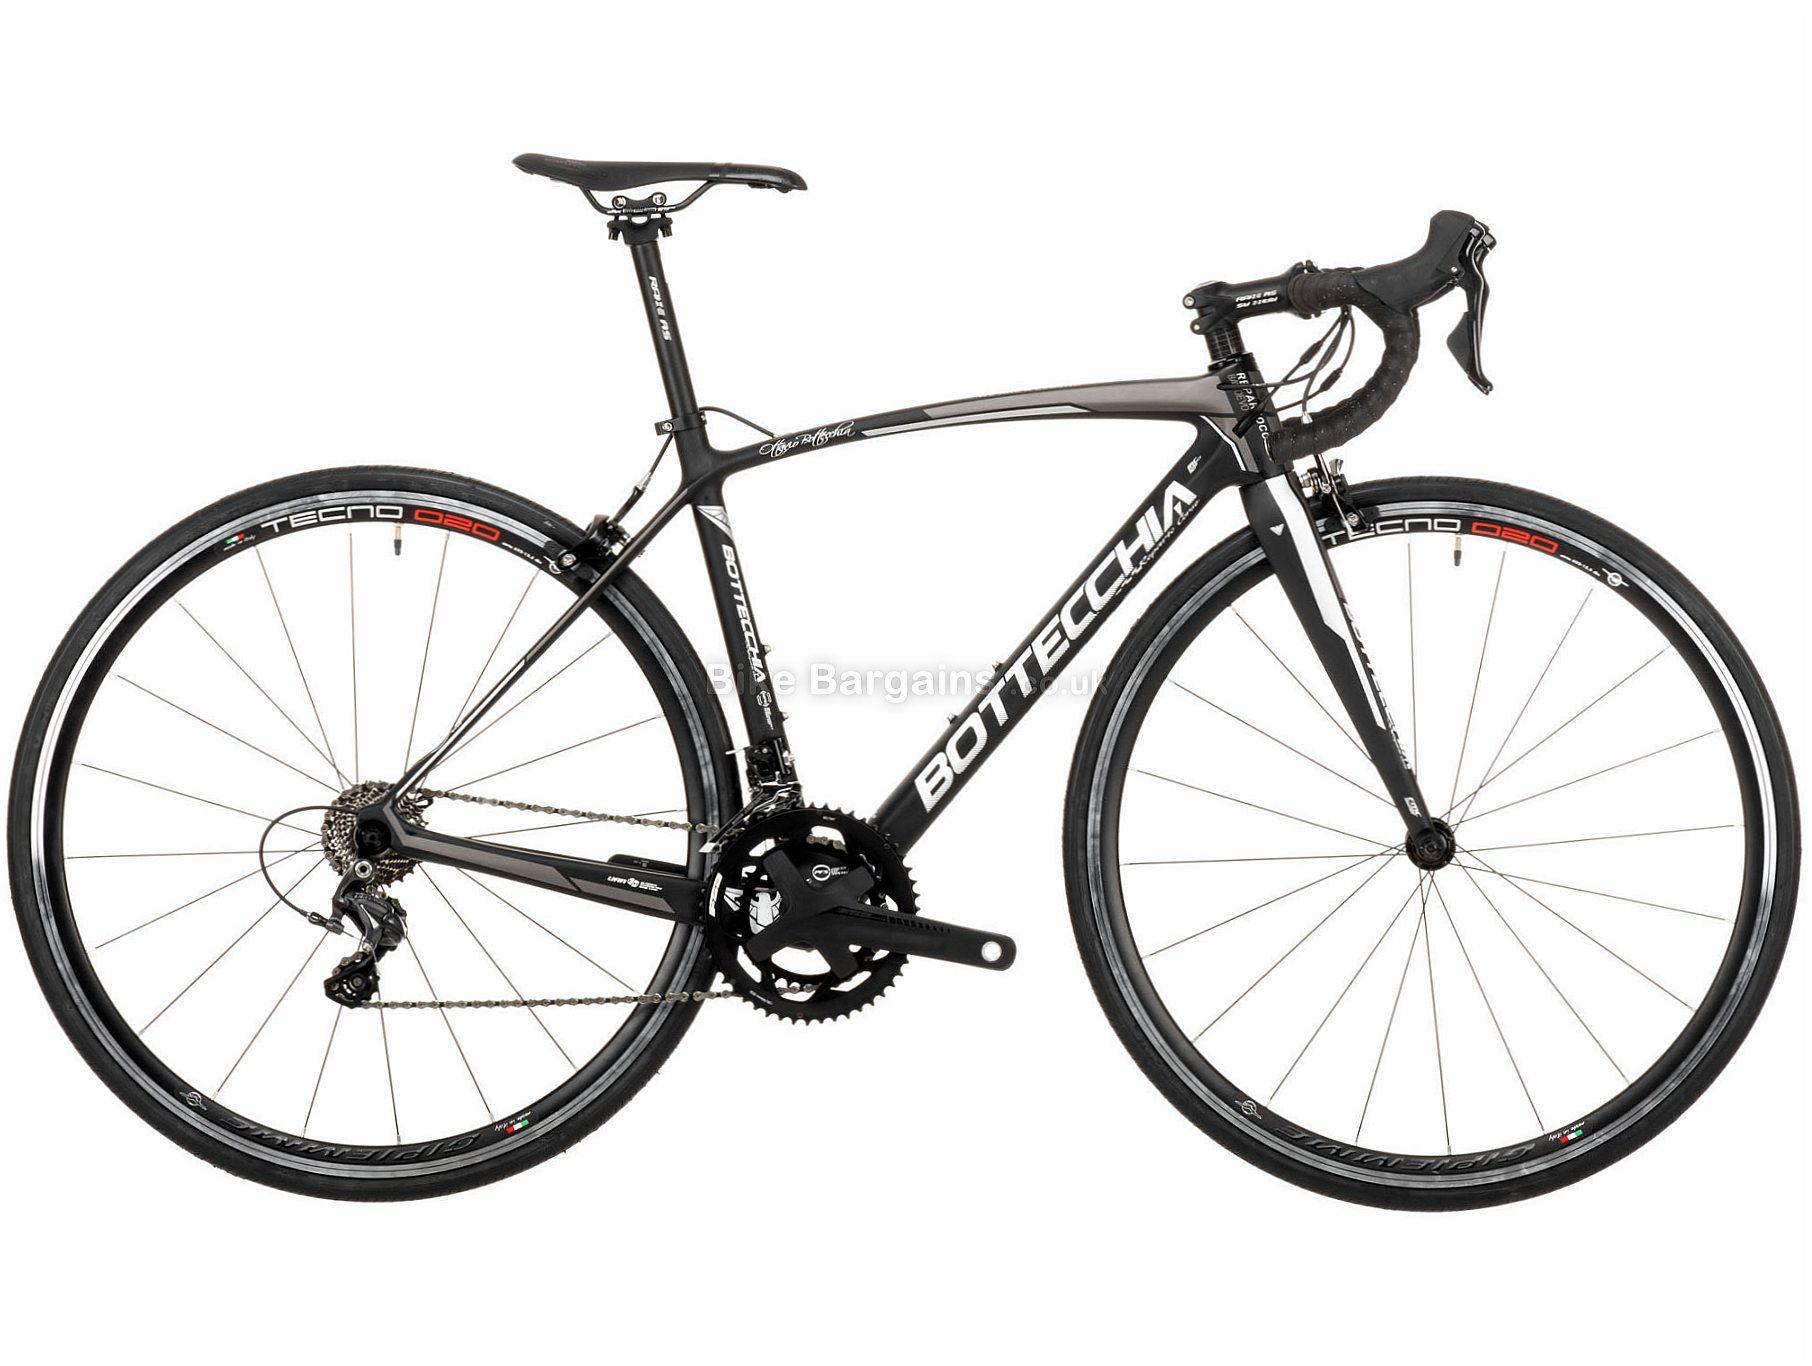 NEW Bottecchia 8AVIO Road Bike 105//Ultegra Mix Carbon//Red size 47 Retail $1999